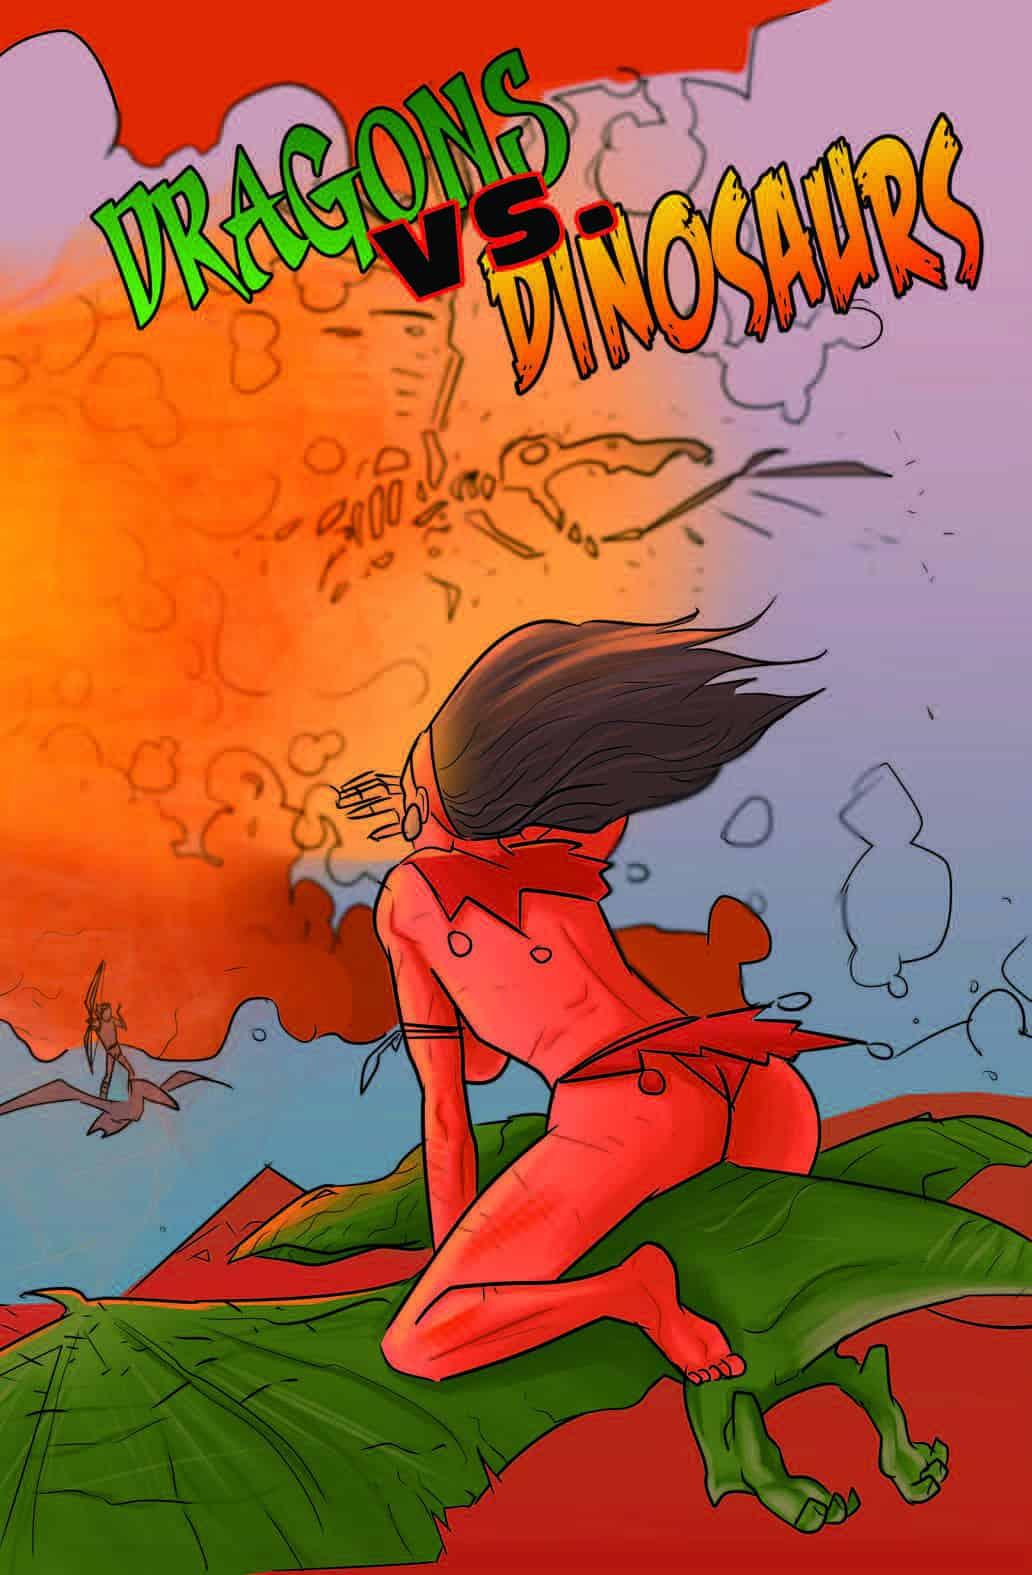 Dragons-vs-Dinosaurs-image-03